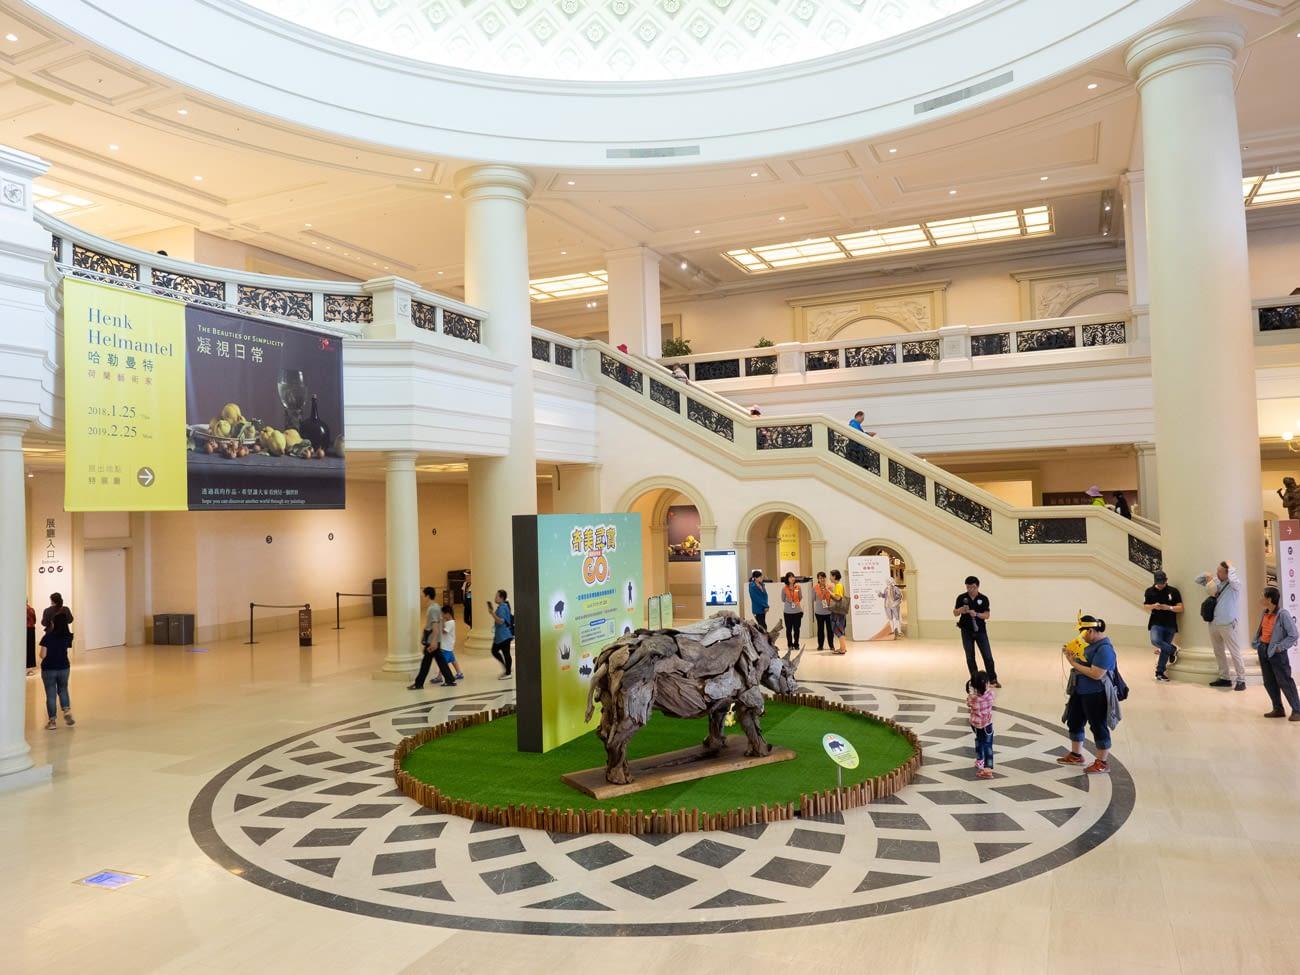 Tainan - Pokemon Go Safari Event - Chimei museum lobby area